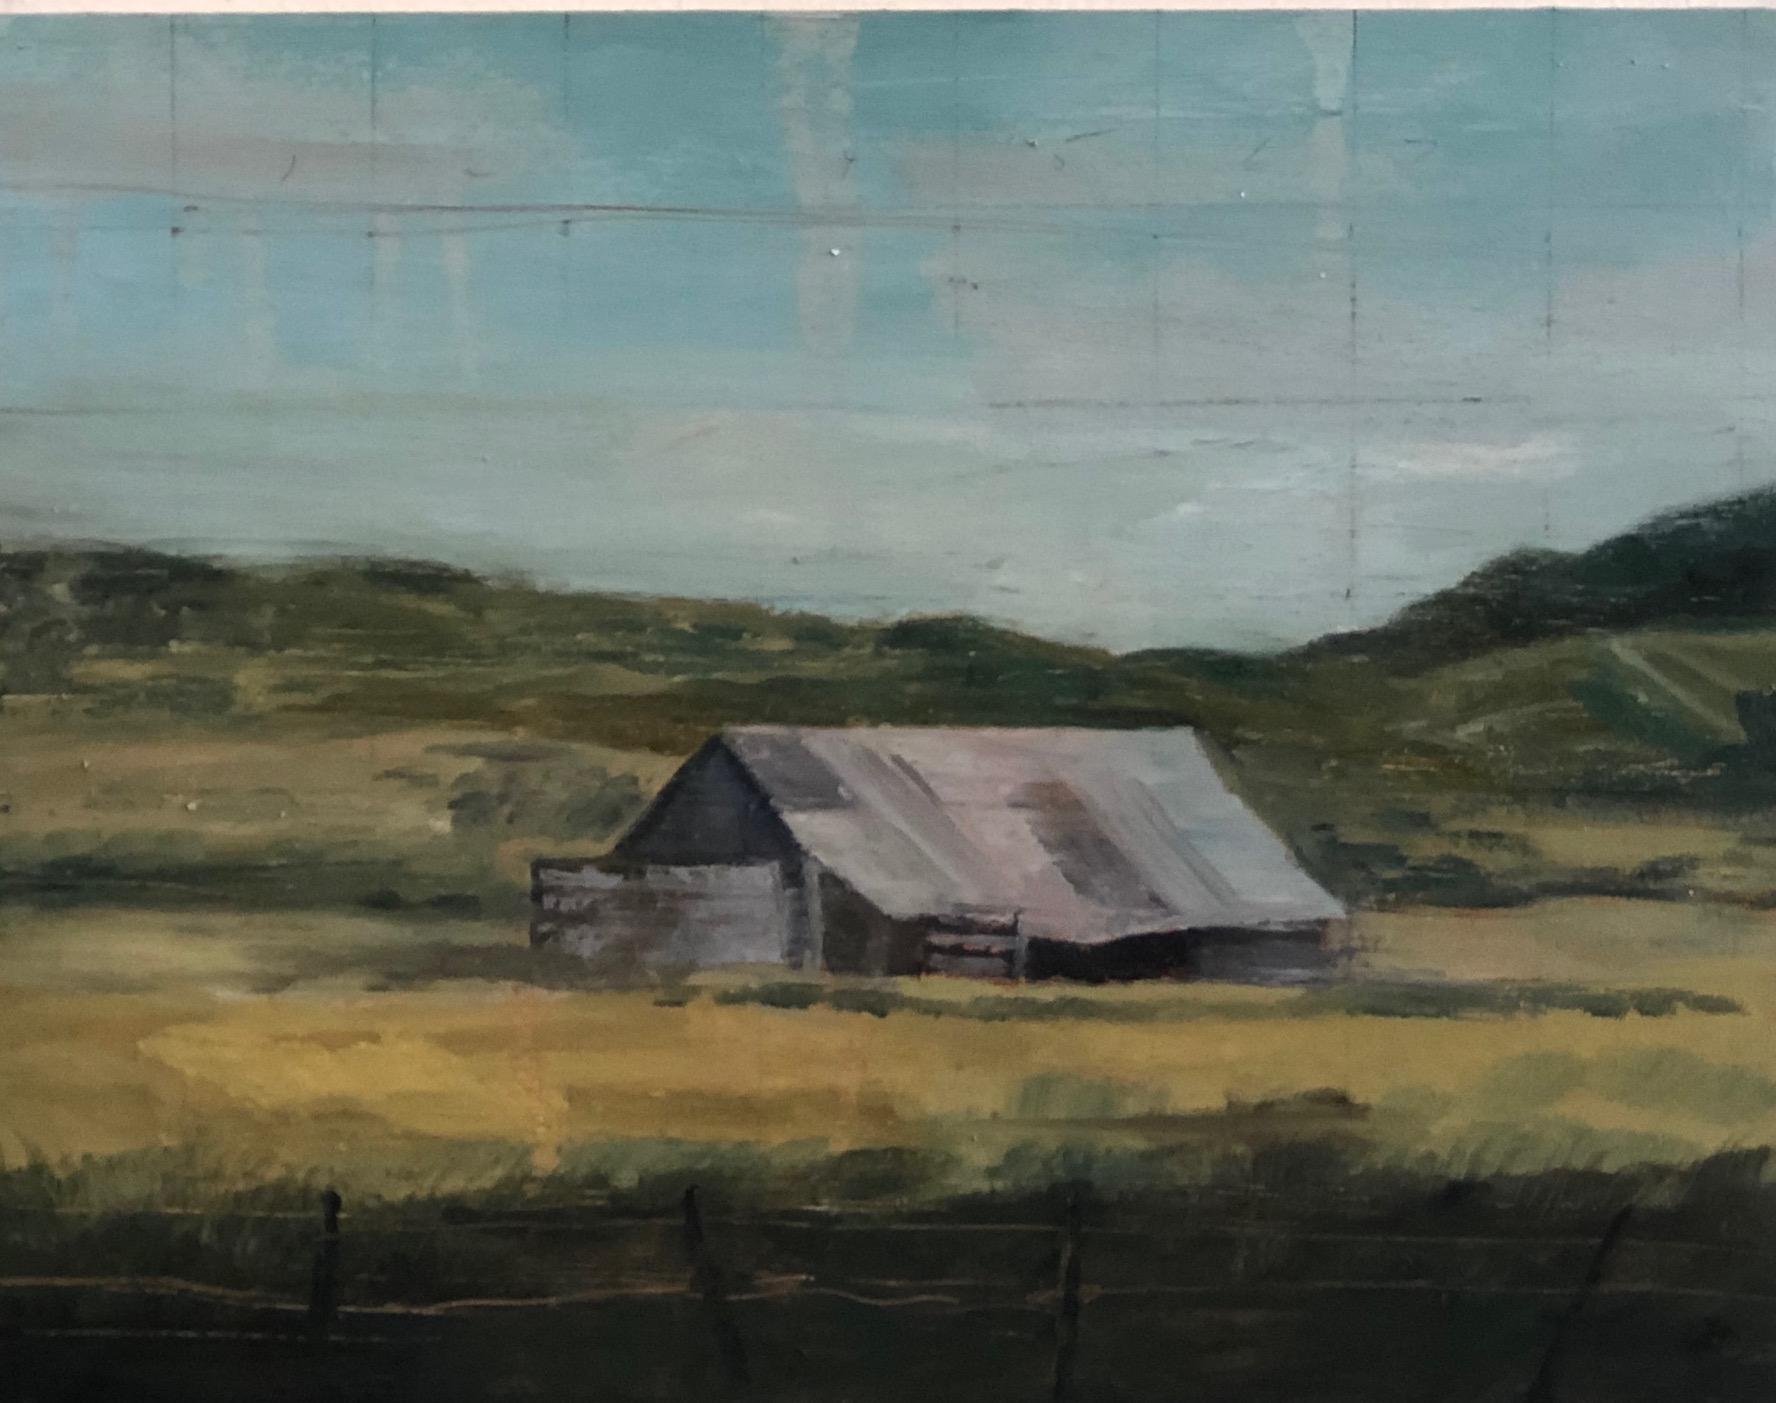 Kamas by Tom Judd